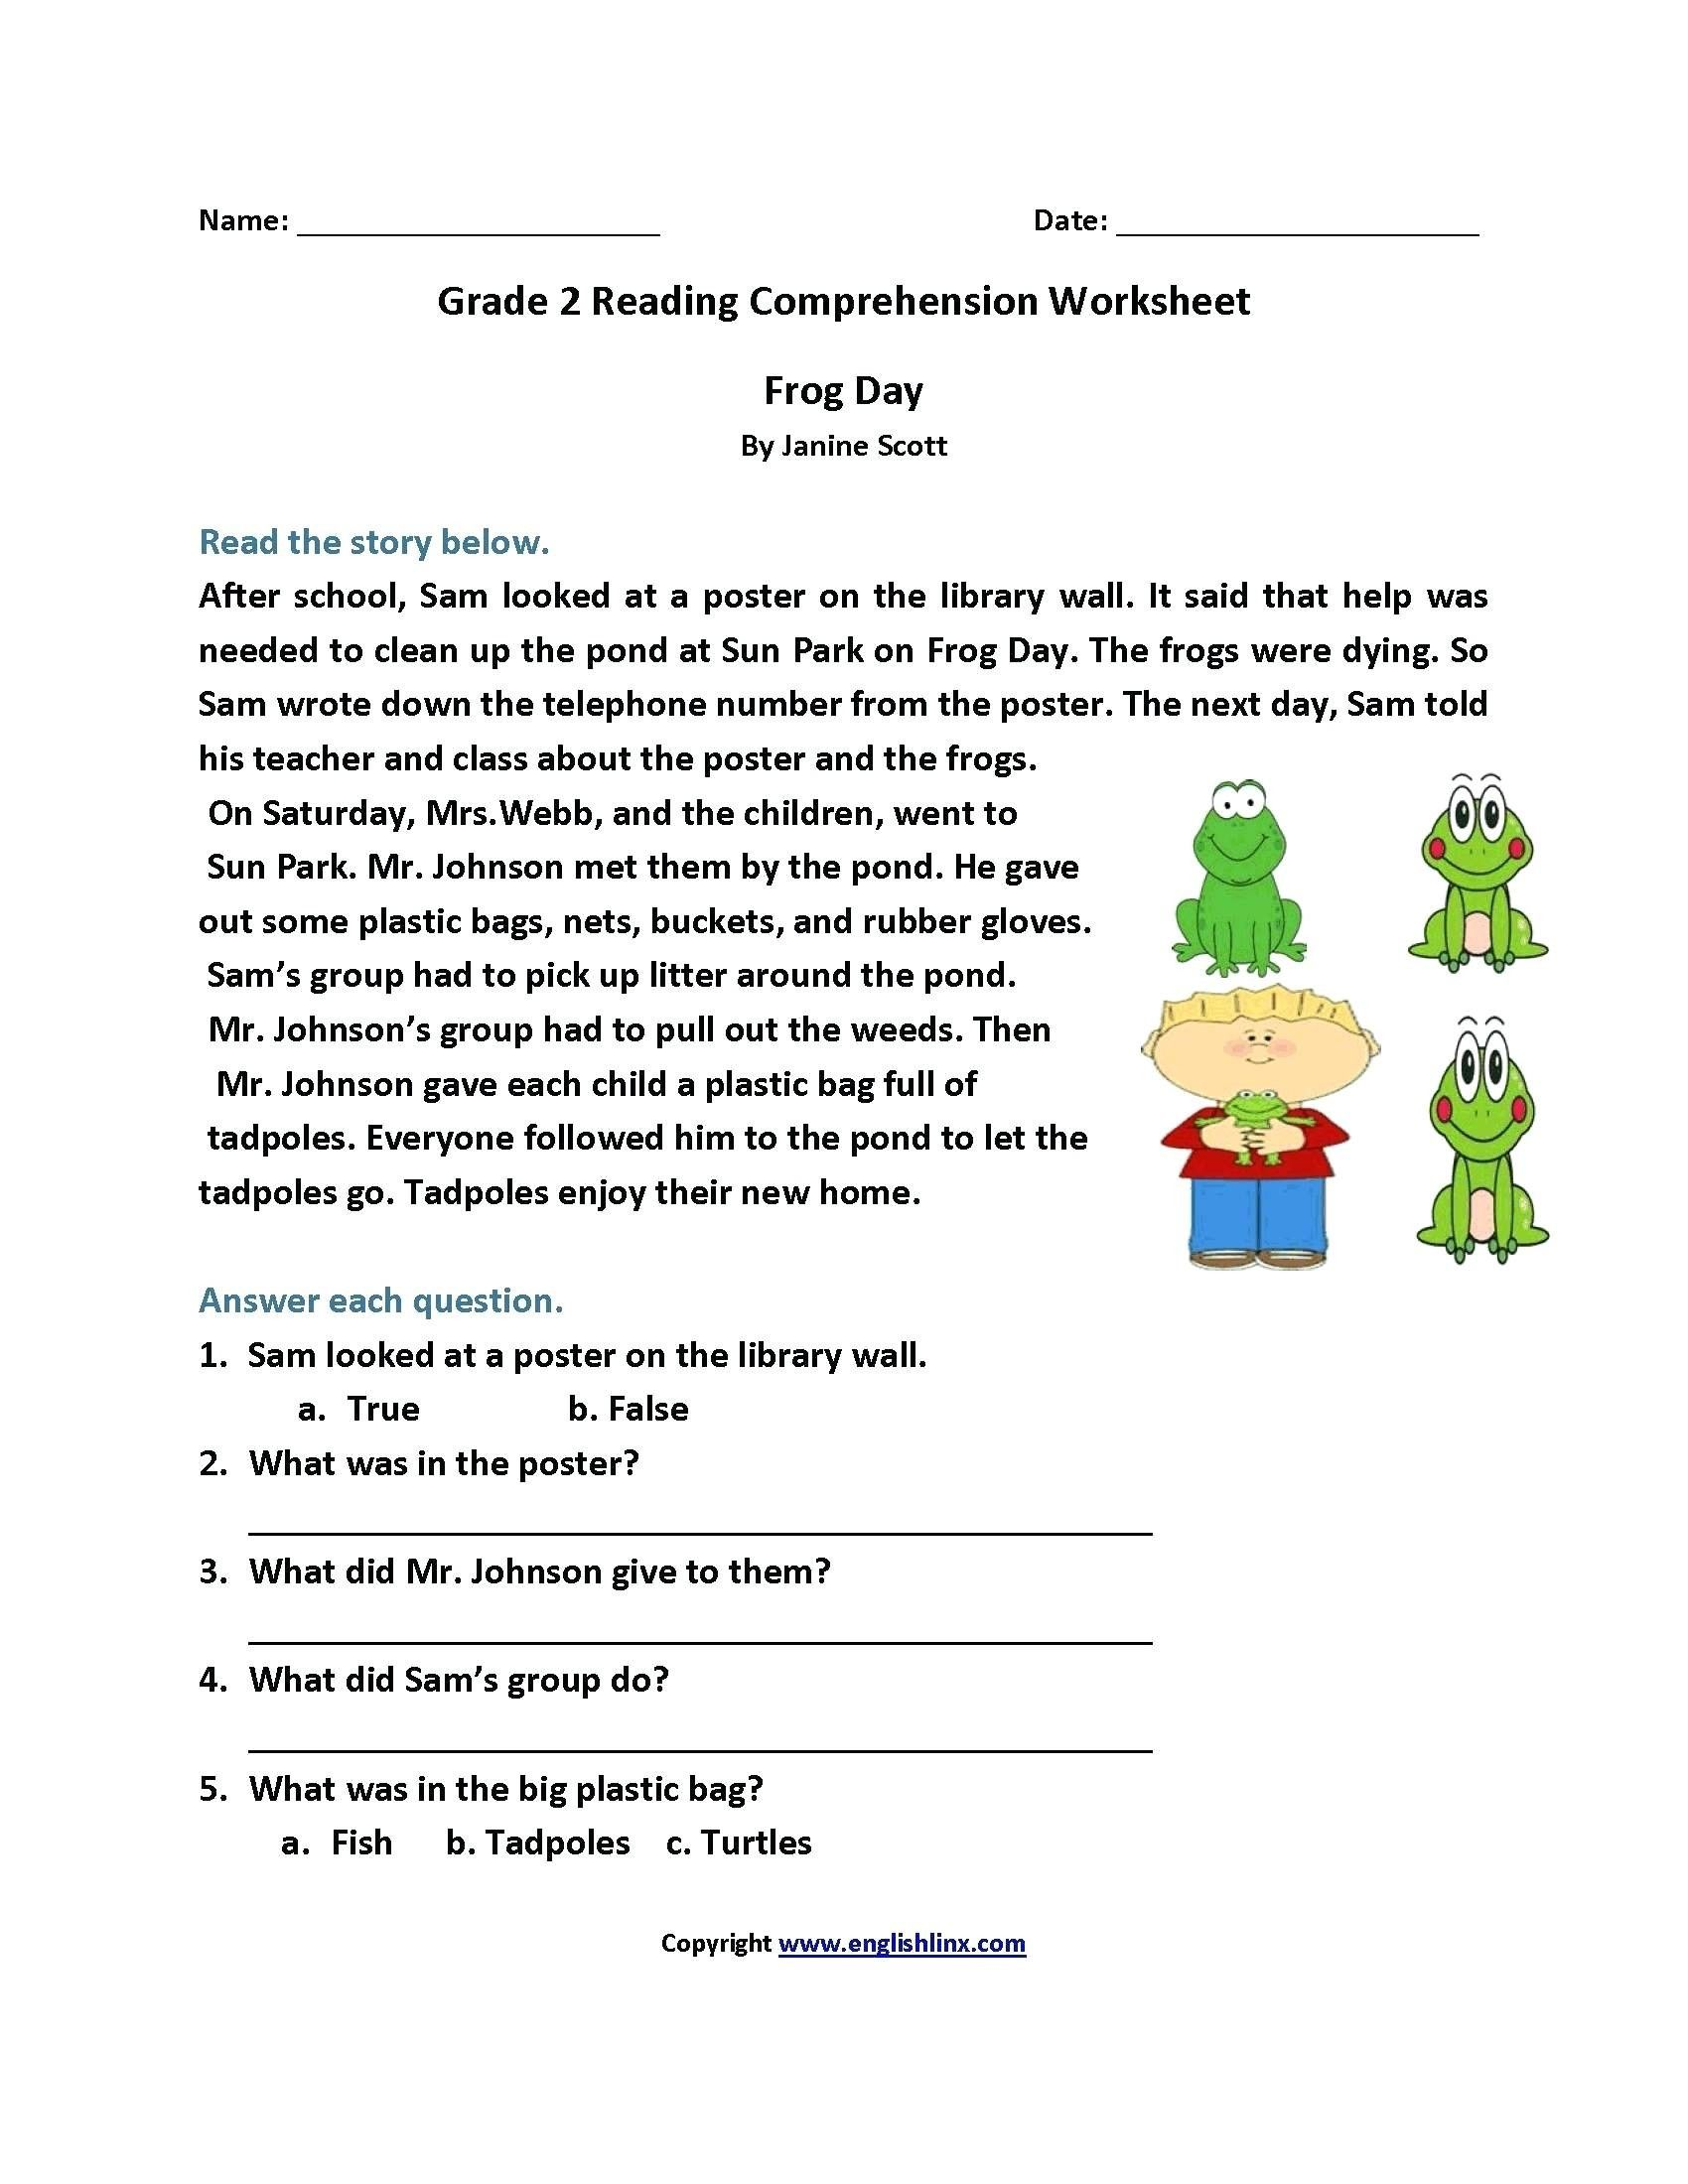 Cloze Procedure Worksheet 4th Grade   Printable Worksheets and Activities  for Teachers [ 2200 x 1700 Pixel ]